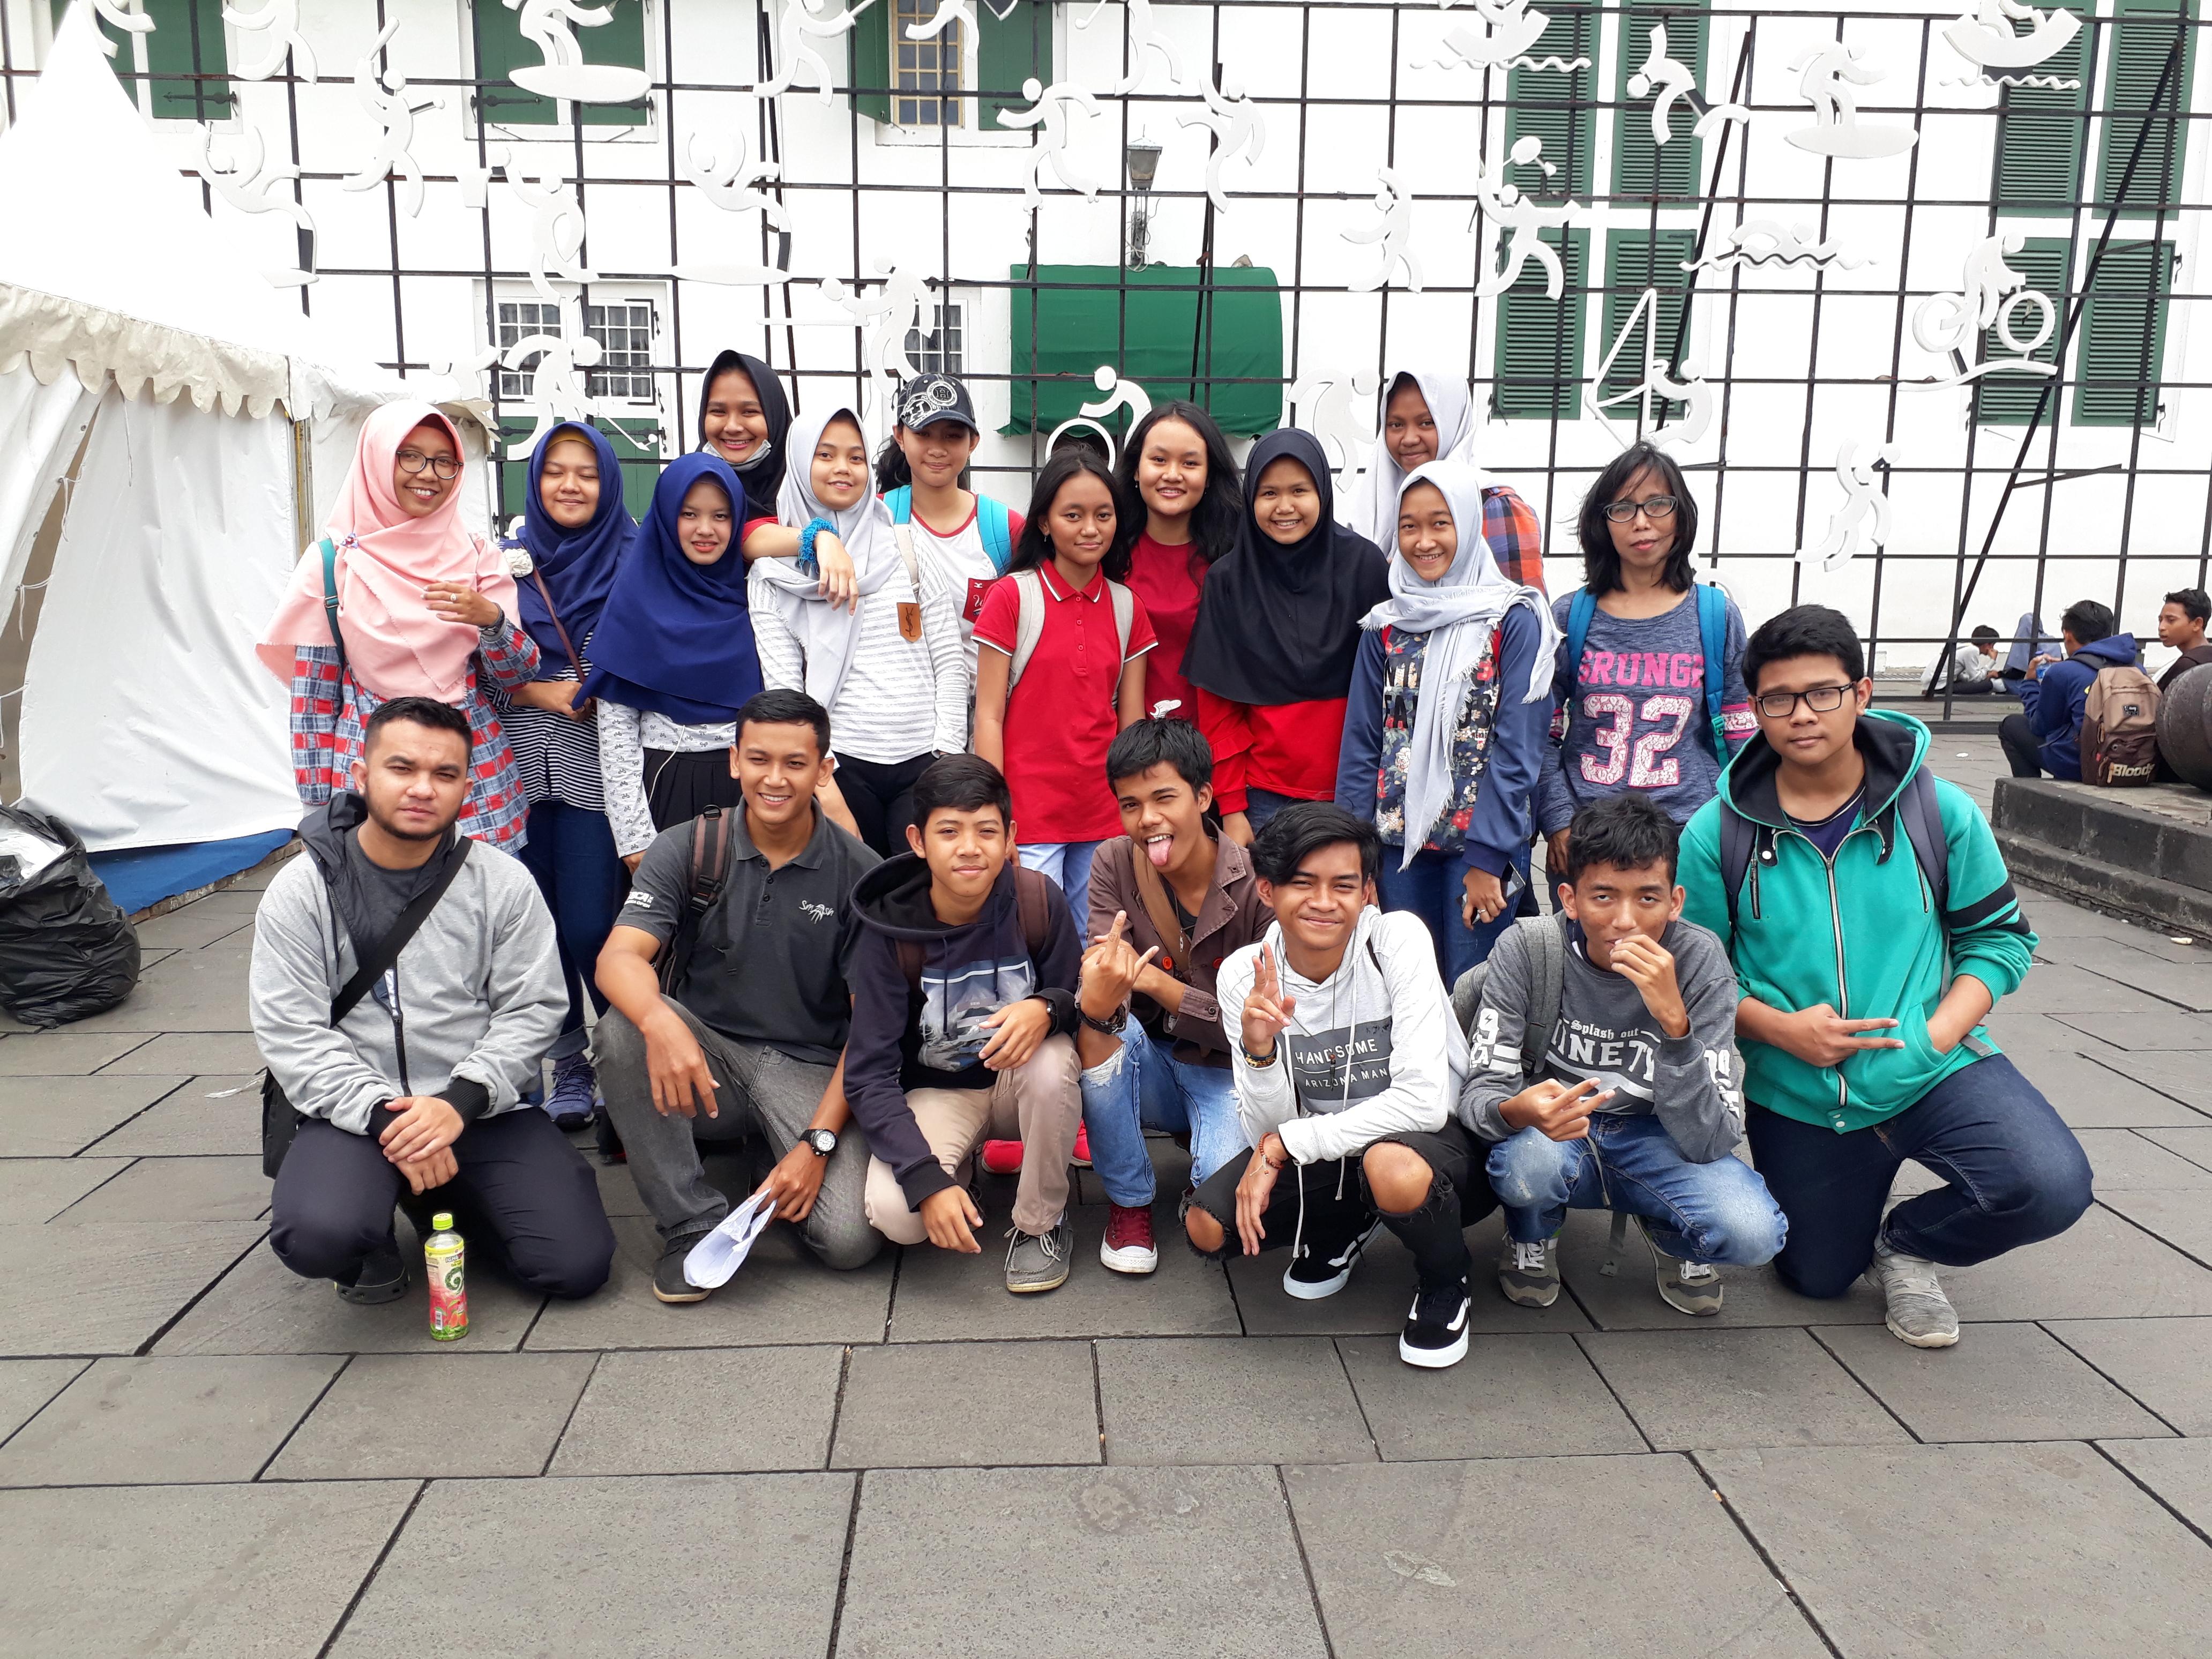 BBC Depok 1 Goes To Kota Tua